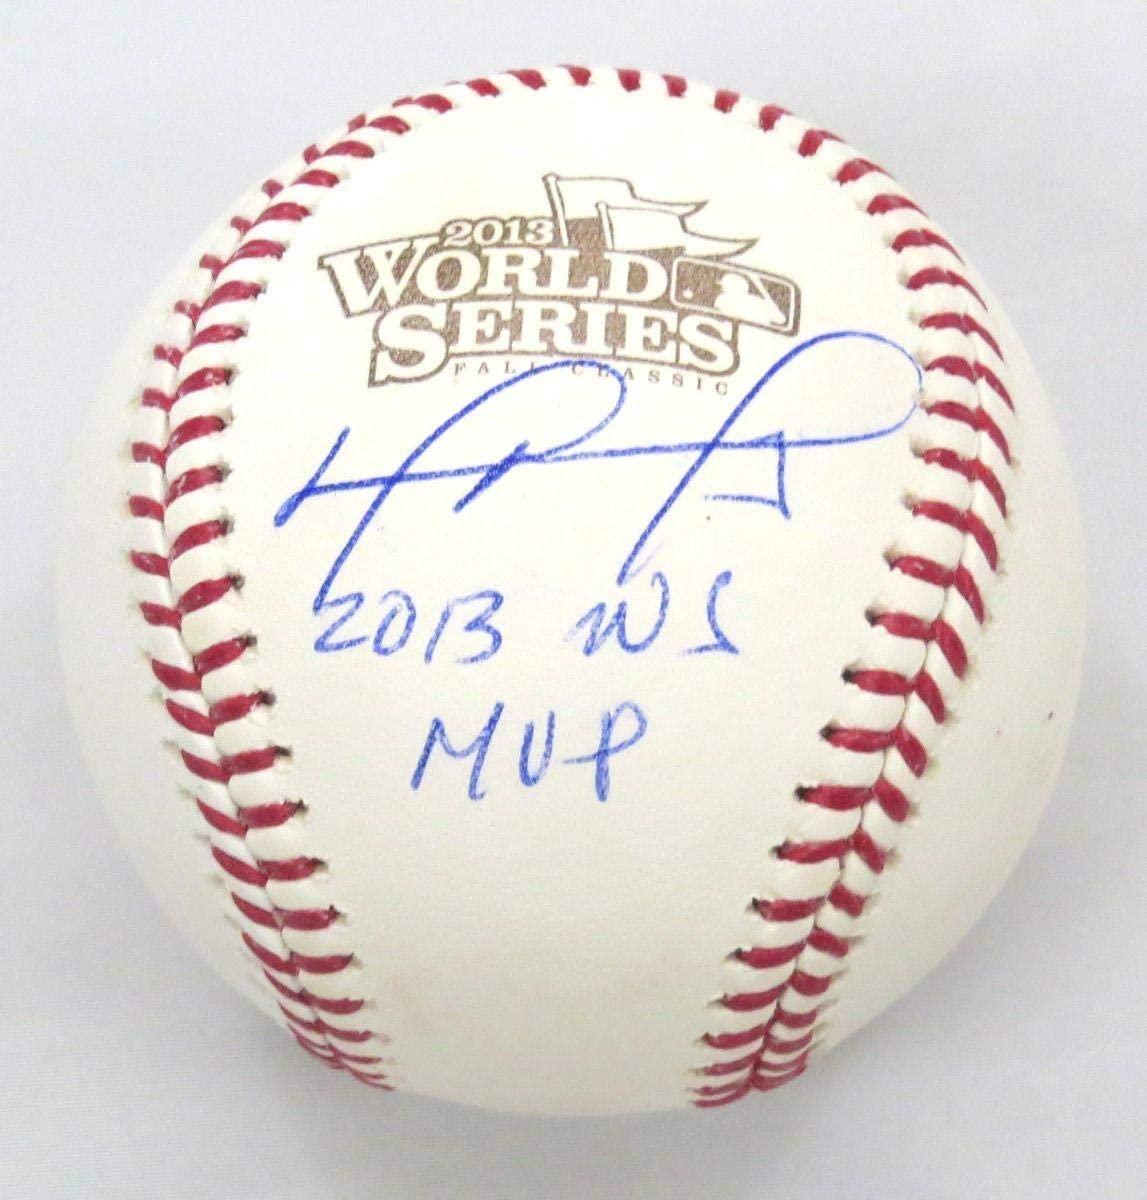 Autographed David Ortiz Baseball - 2013 World Series W 2013 WS MVP Beckett Witnessed - Autographed Baseballs